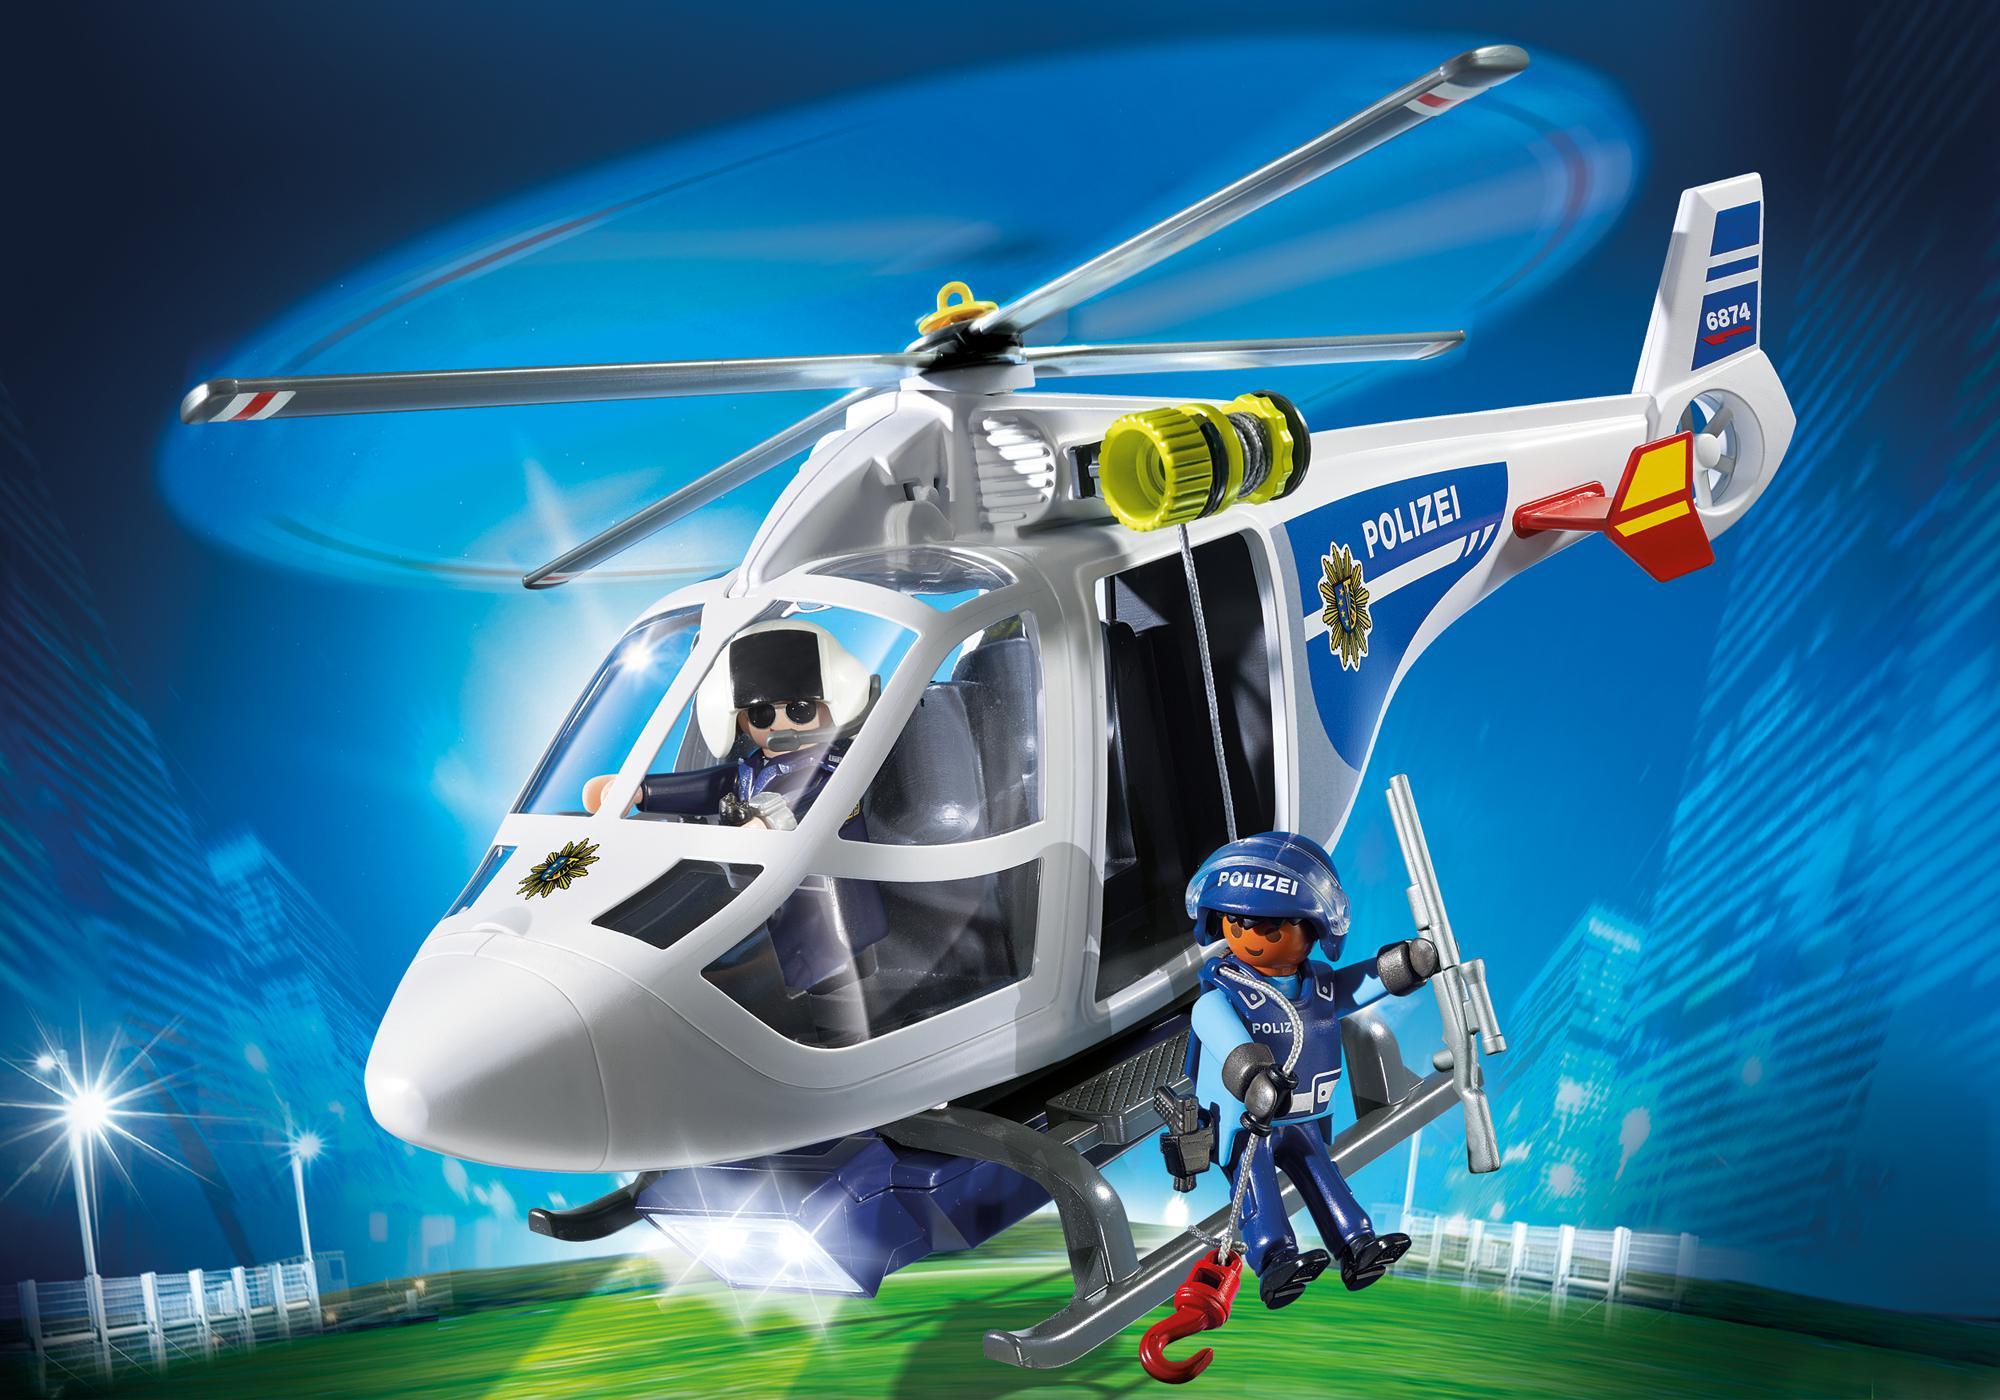 6874_product_detail/Polizei-Helikopter mit LED-Suchscheinwerfer